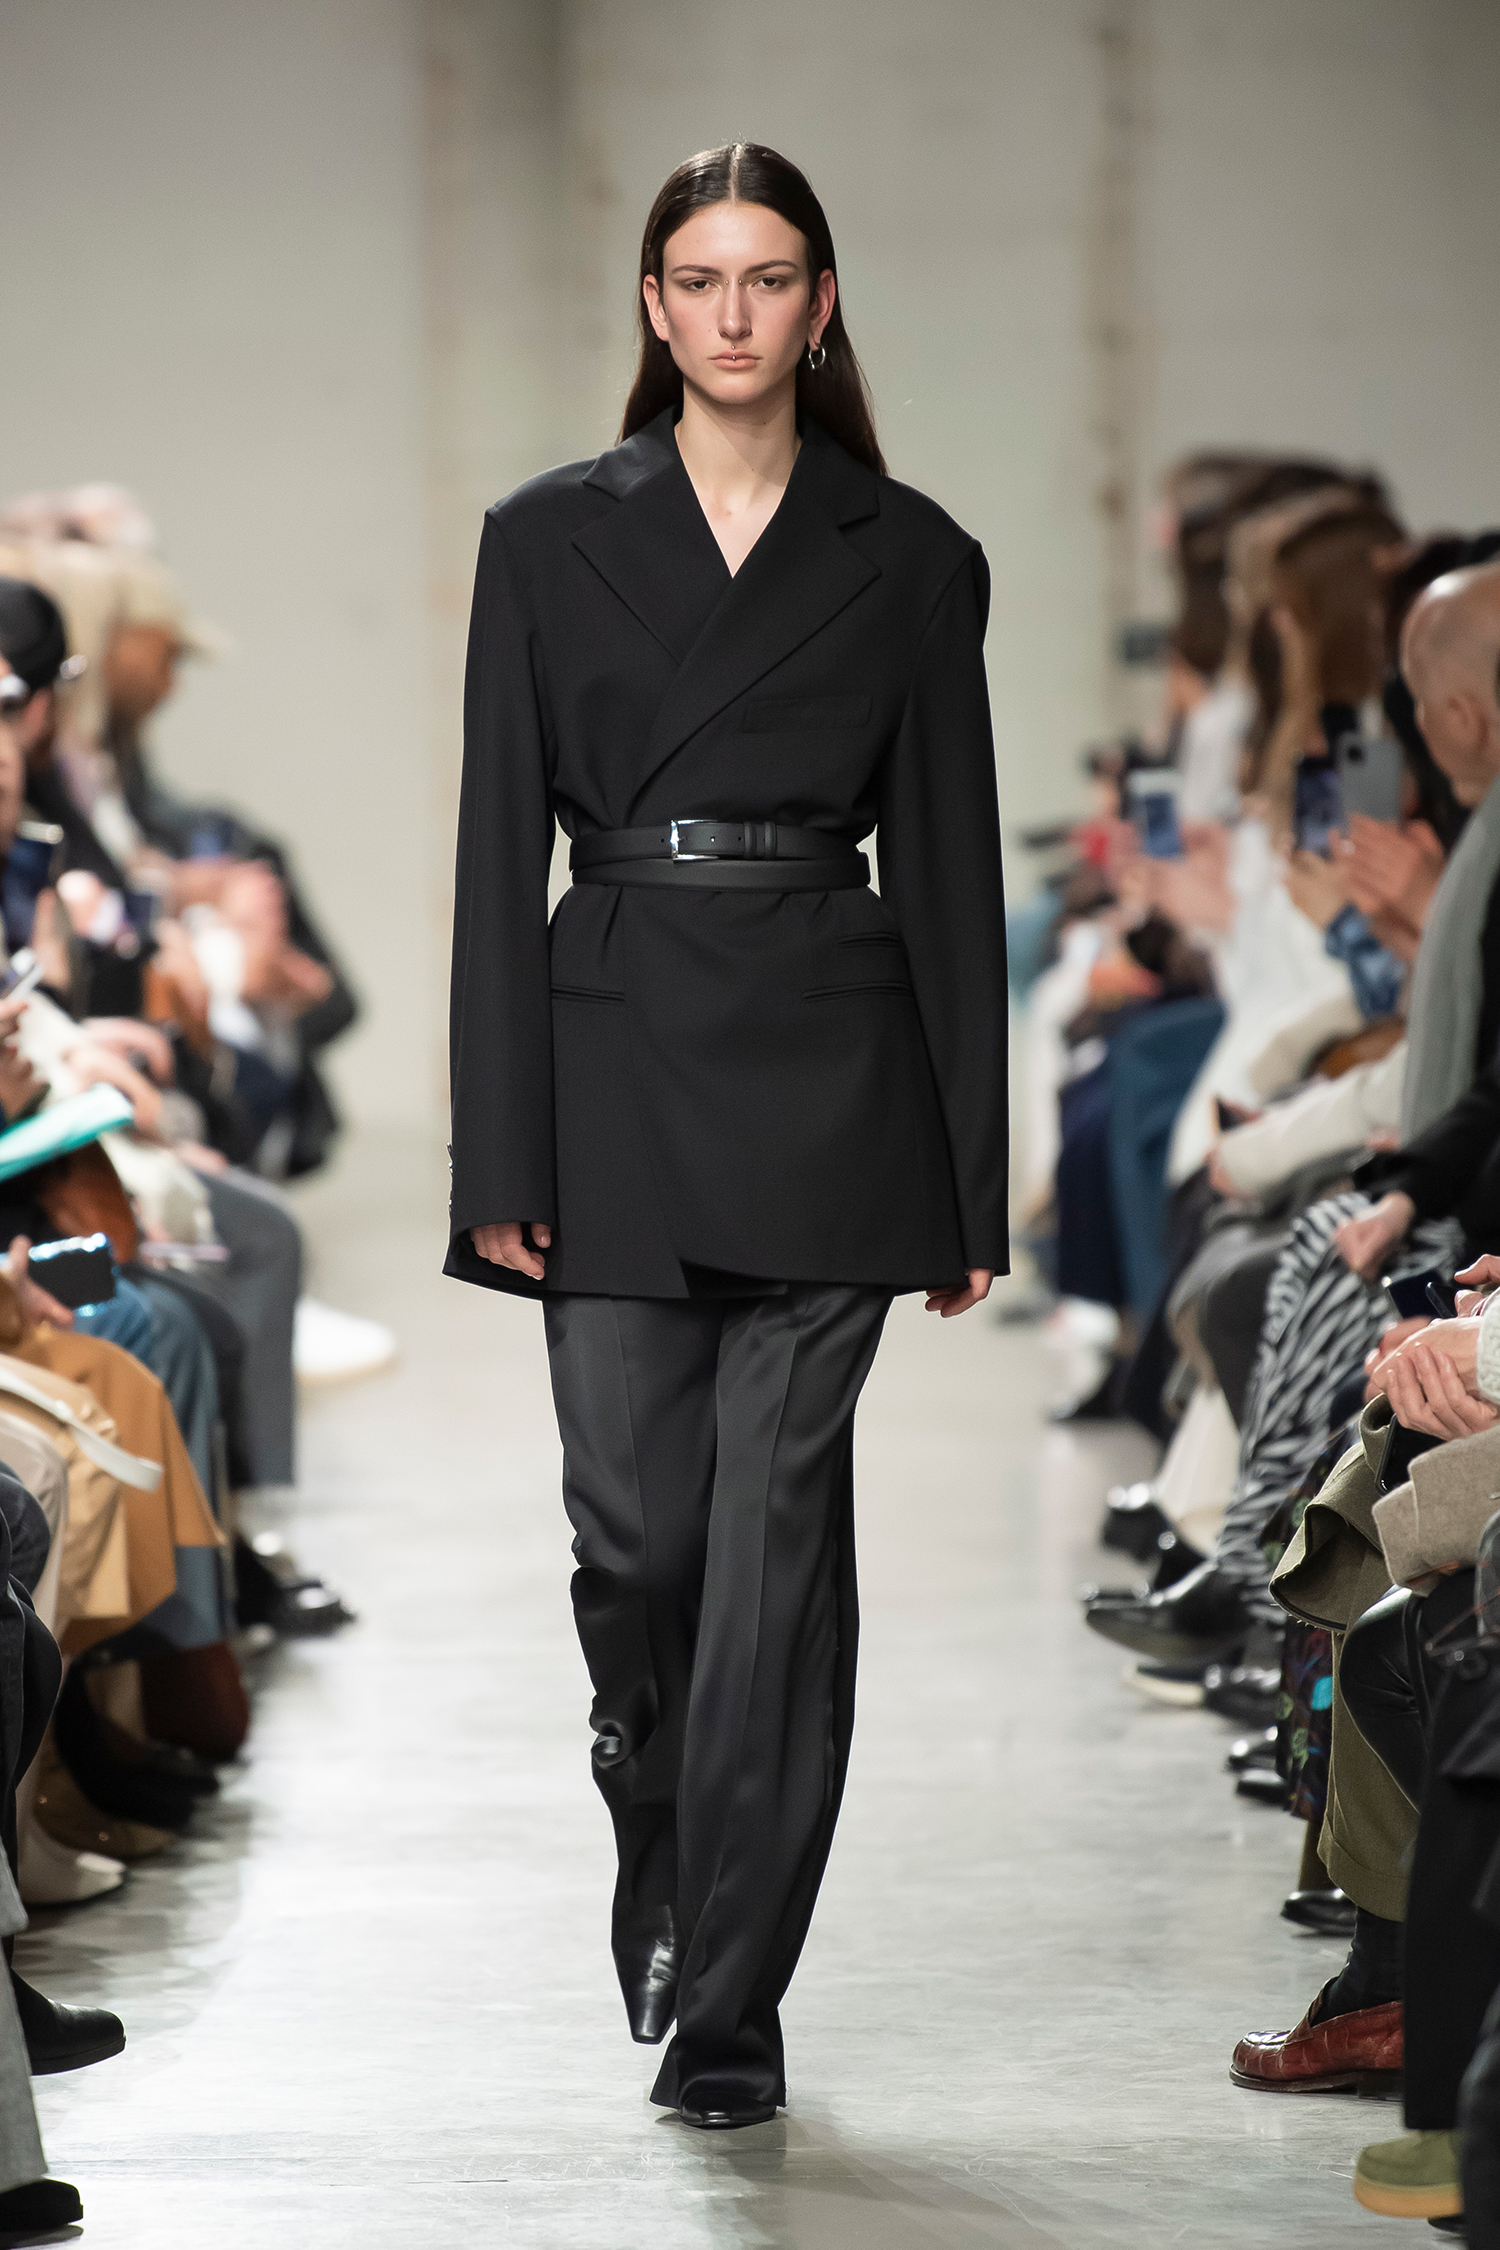 LOOK 8 Jacket RAFE Trousers RIVKA